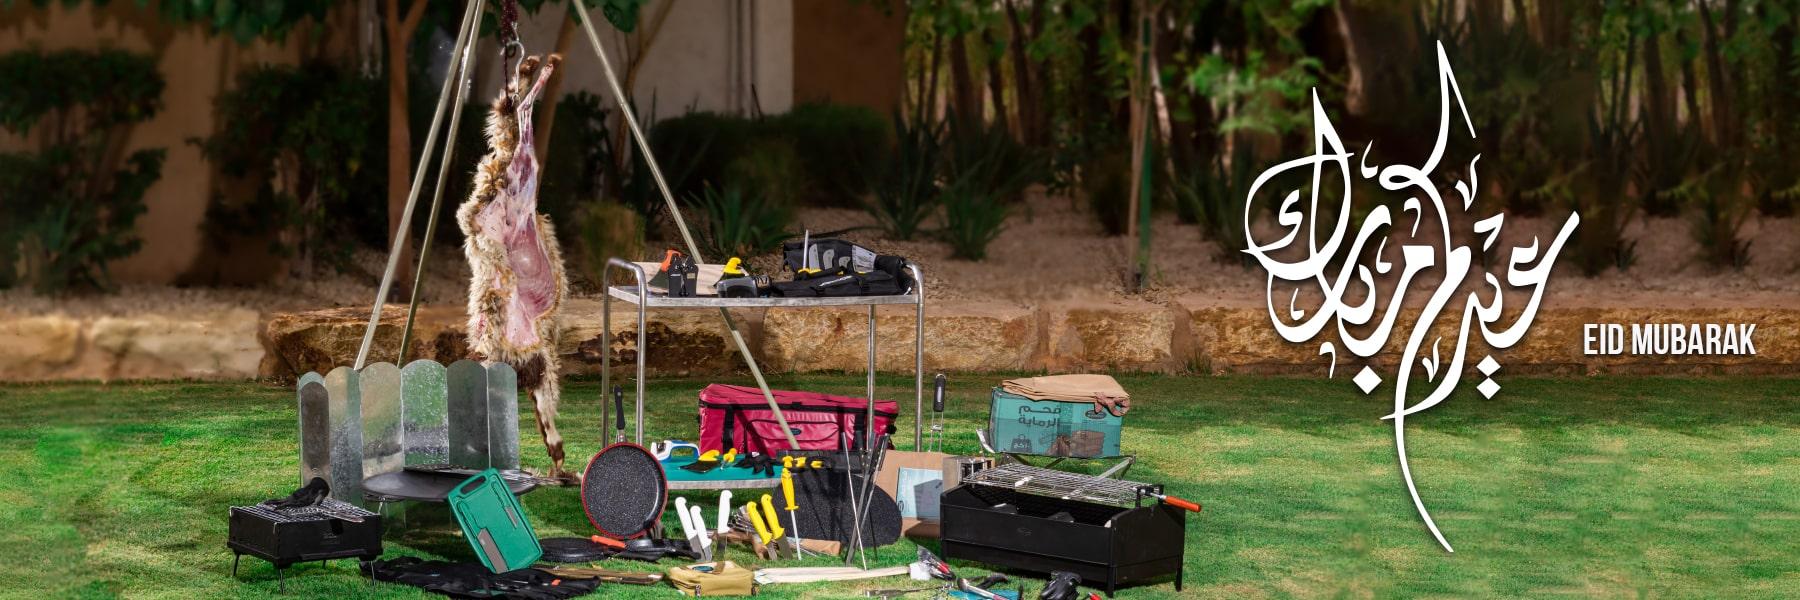 Eid Equipment